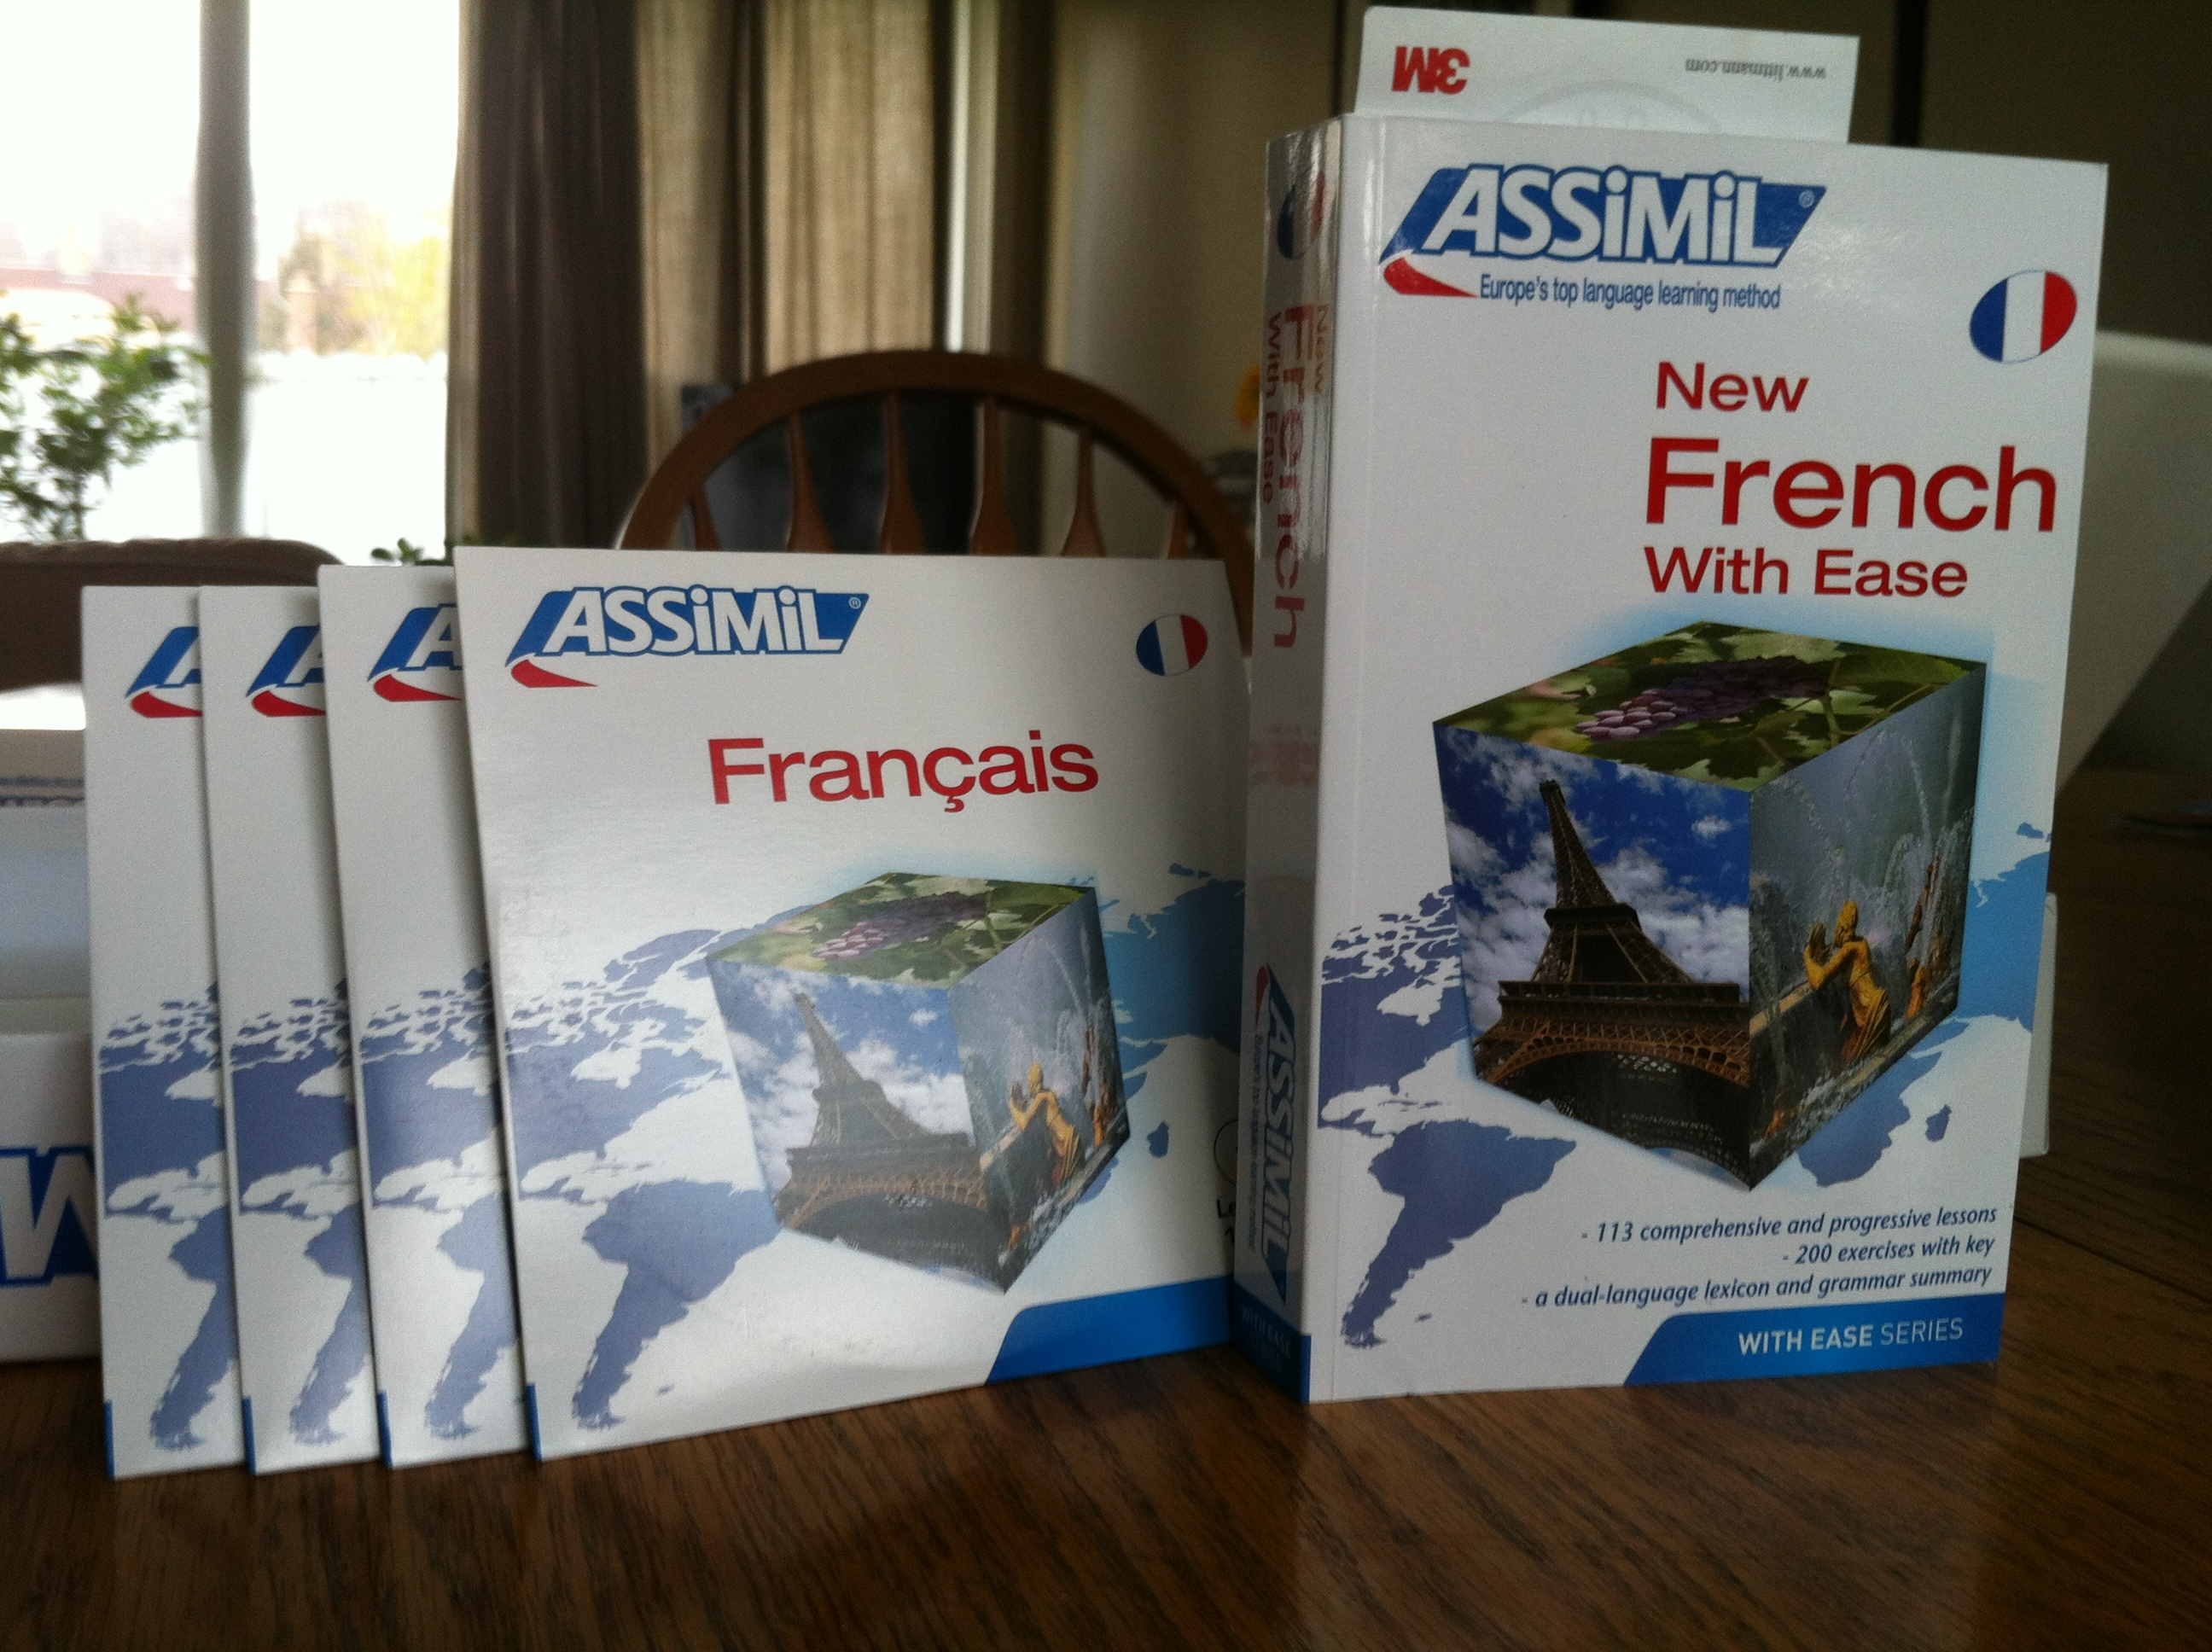 branhuckun - Assimil using english intermediate to advanced pdf